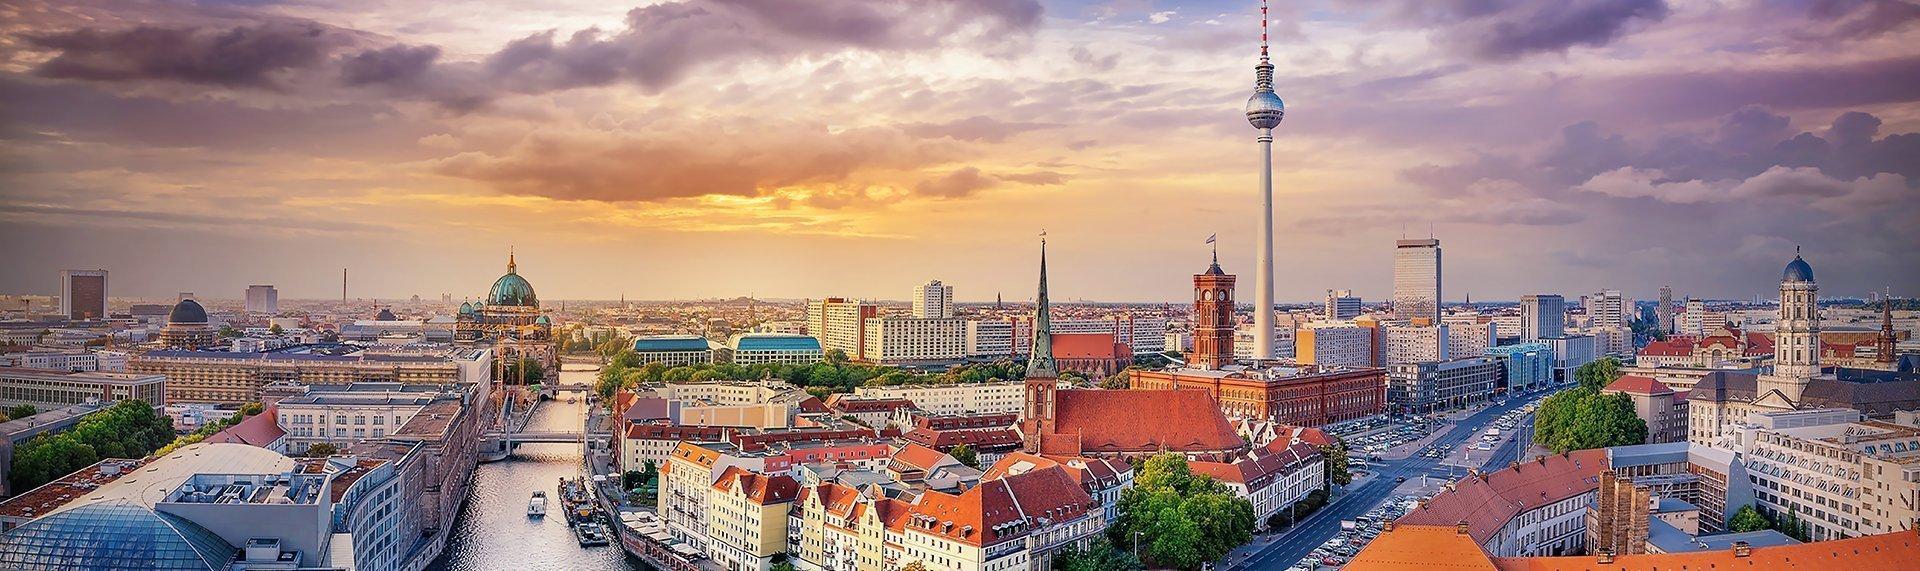 Photo of Berlin skyline